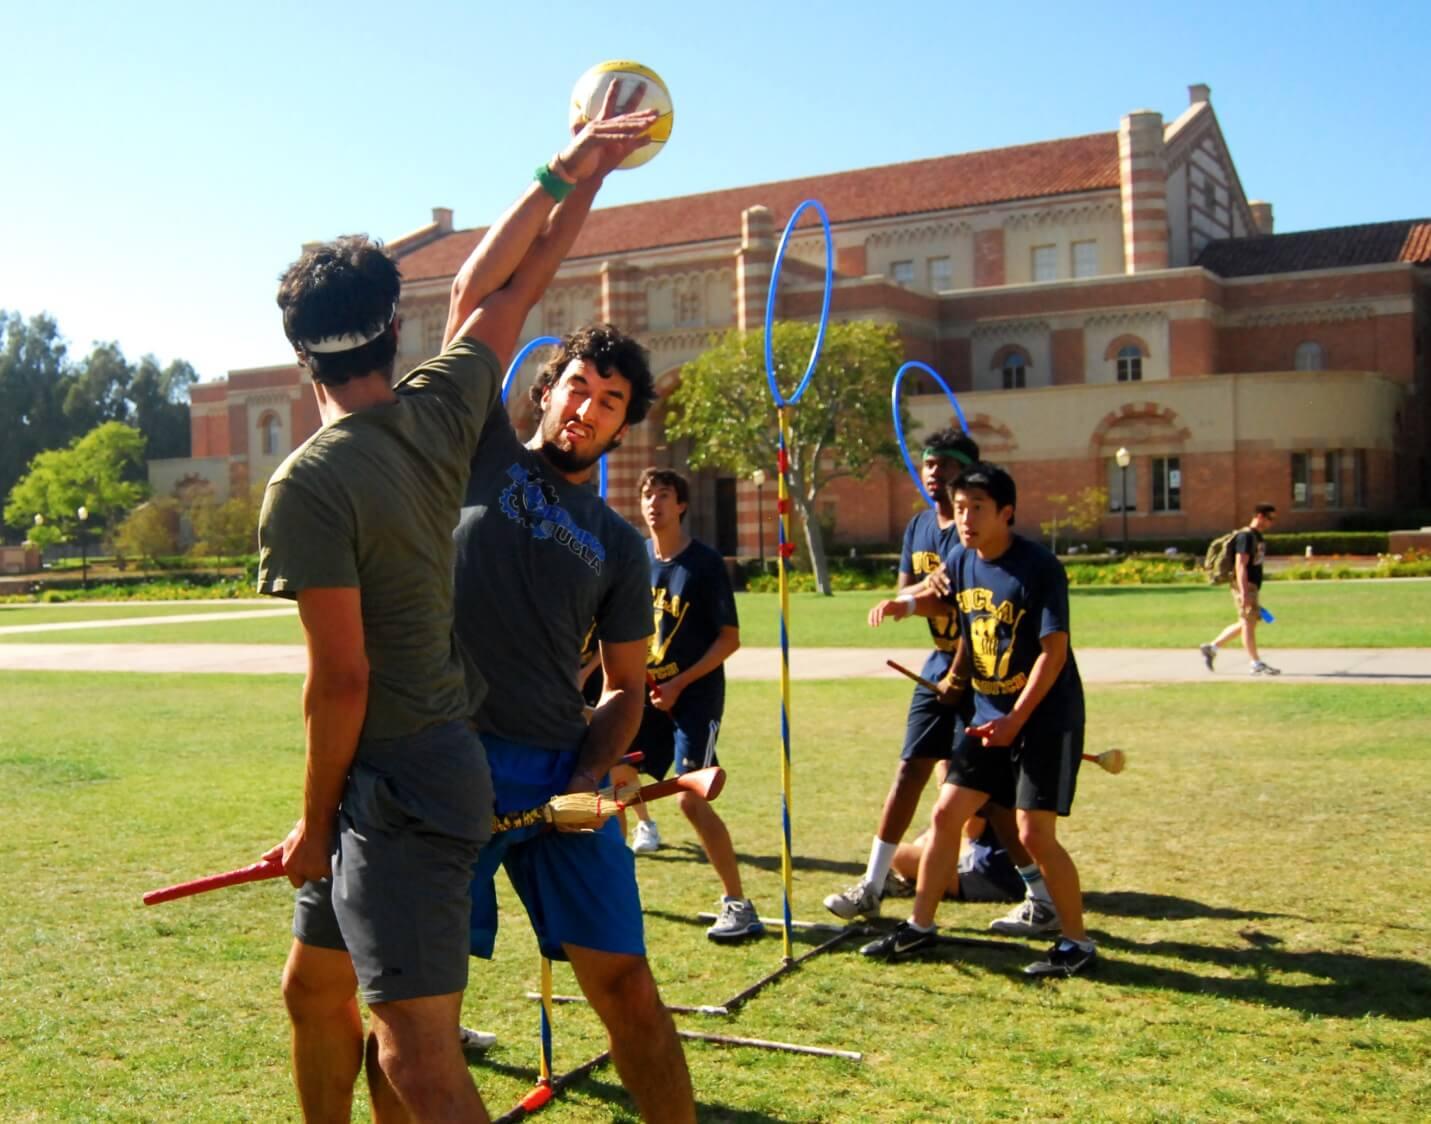 Chances of getting into NYU, University of Washington, UCLA, and more?